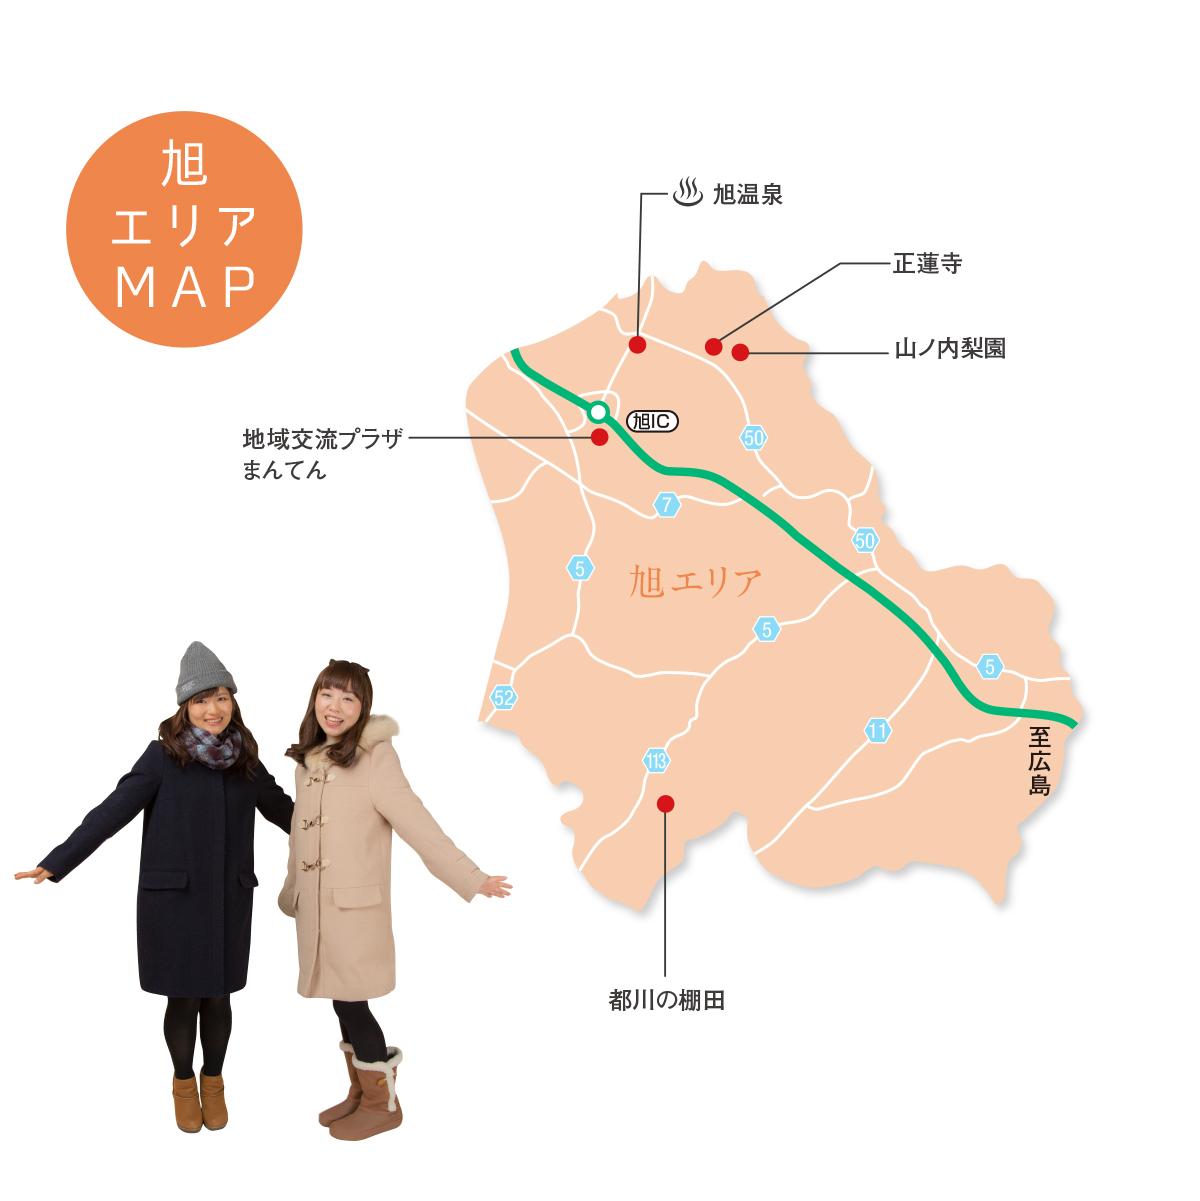 Asahi area MAP